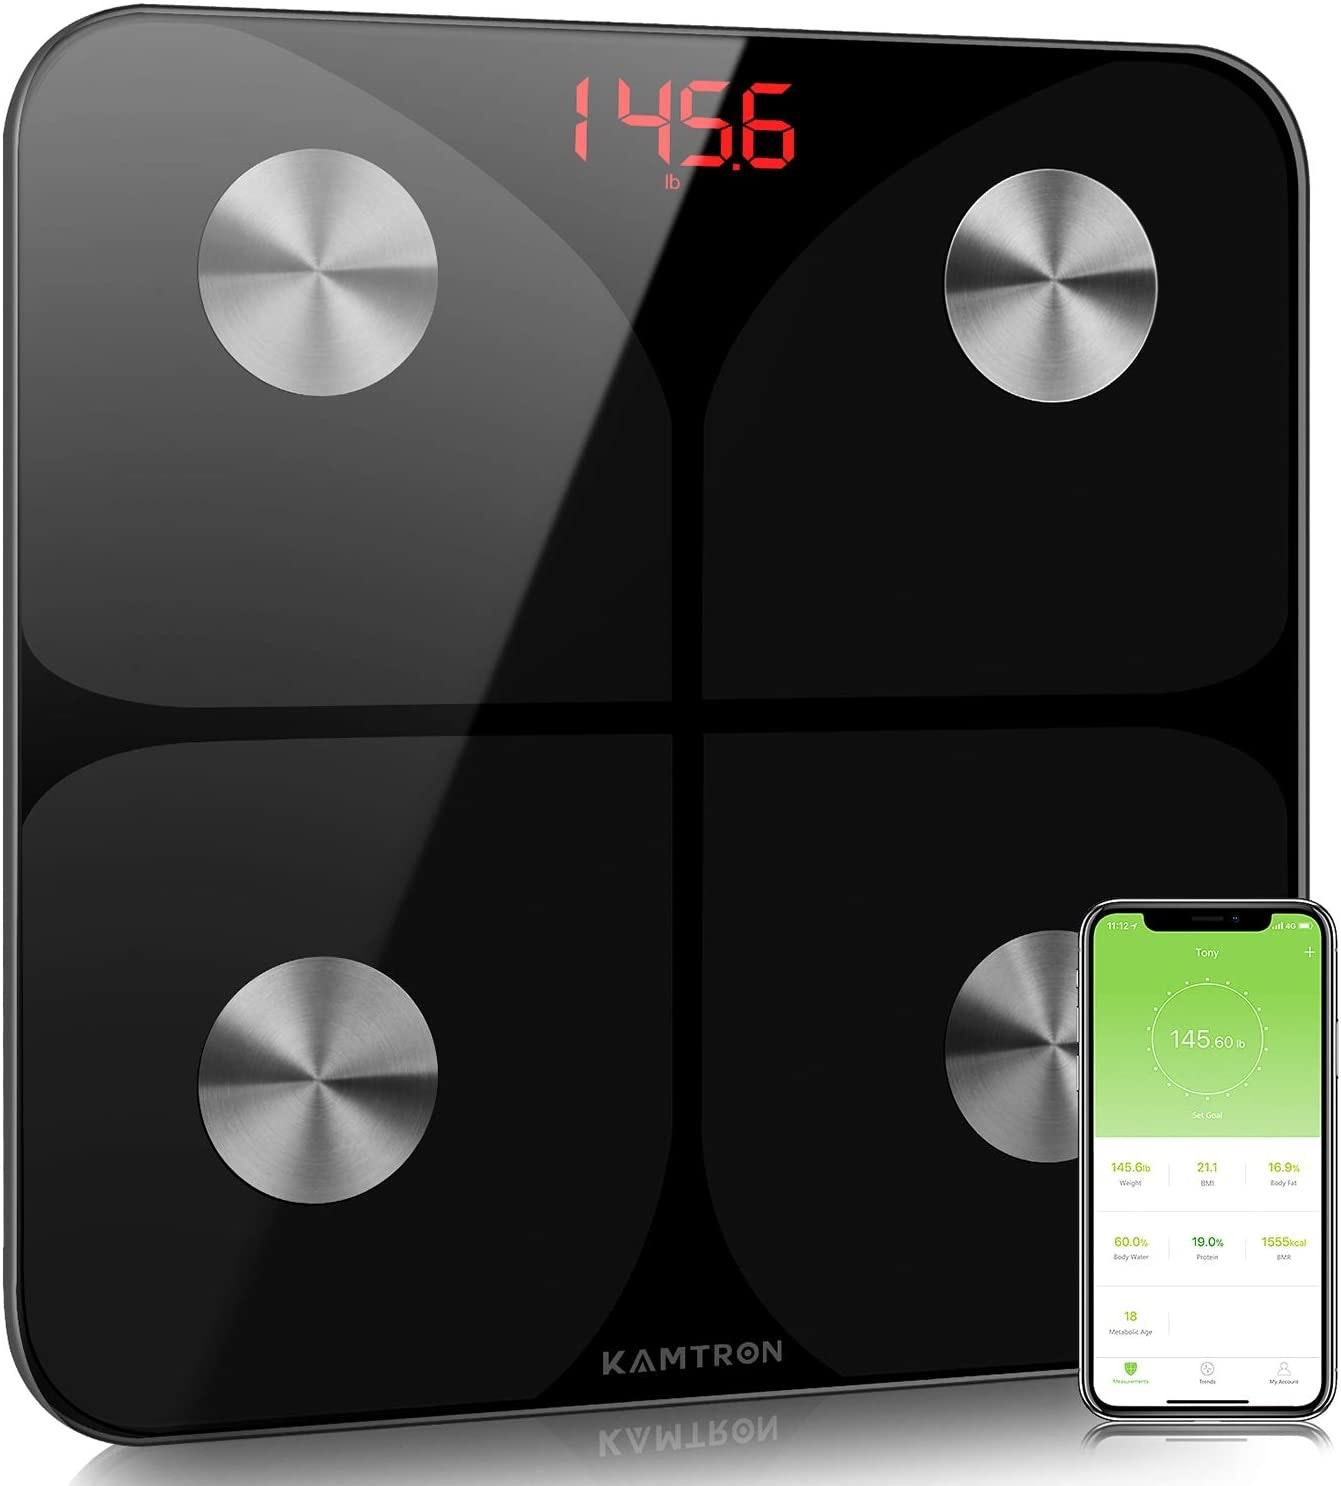 KAMTRON Smart Body Fat Scale